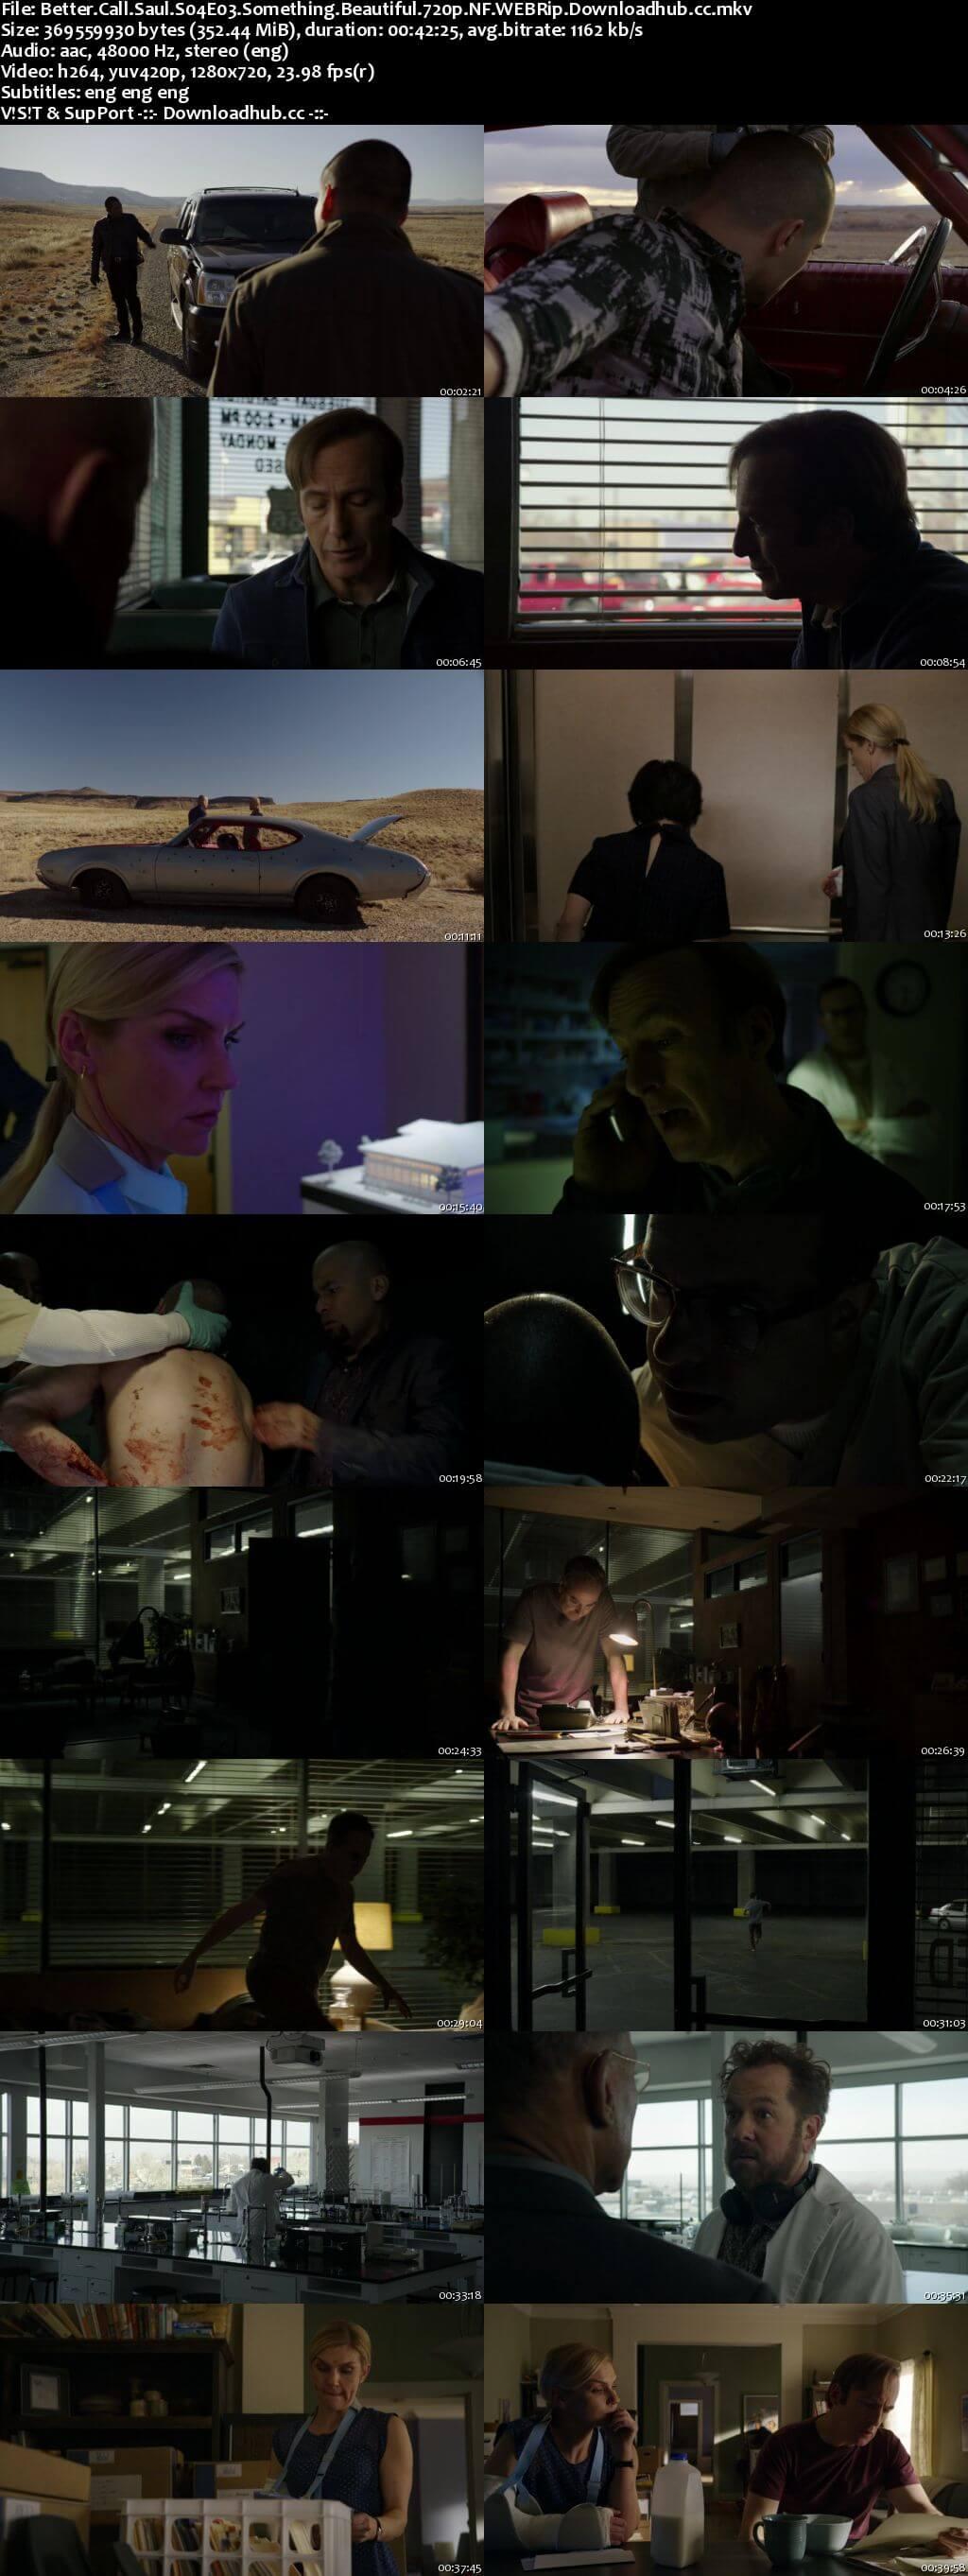 Better Call Saul S04E03 350MB WEB-DL 720p x264 MSubs